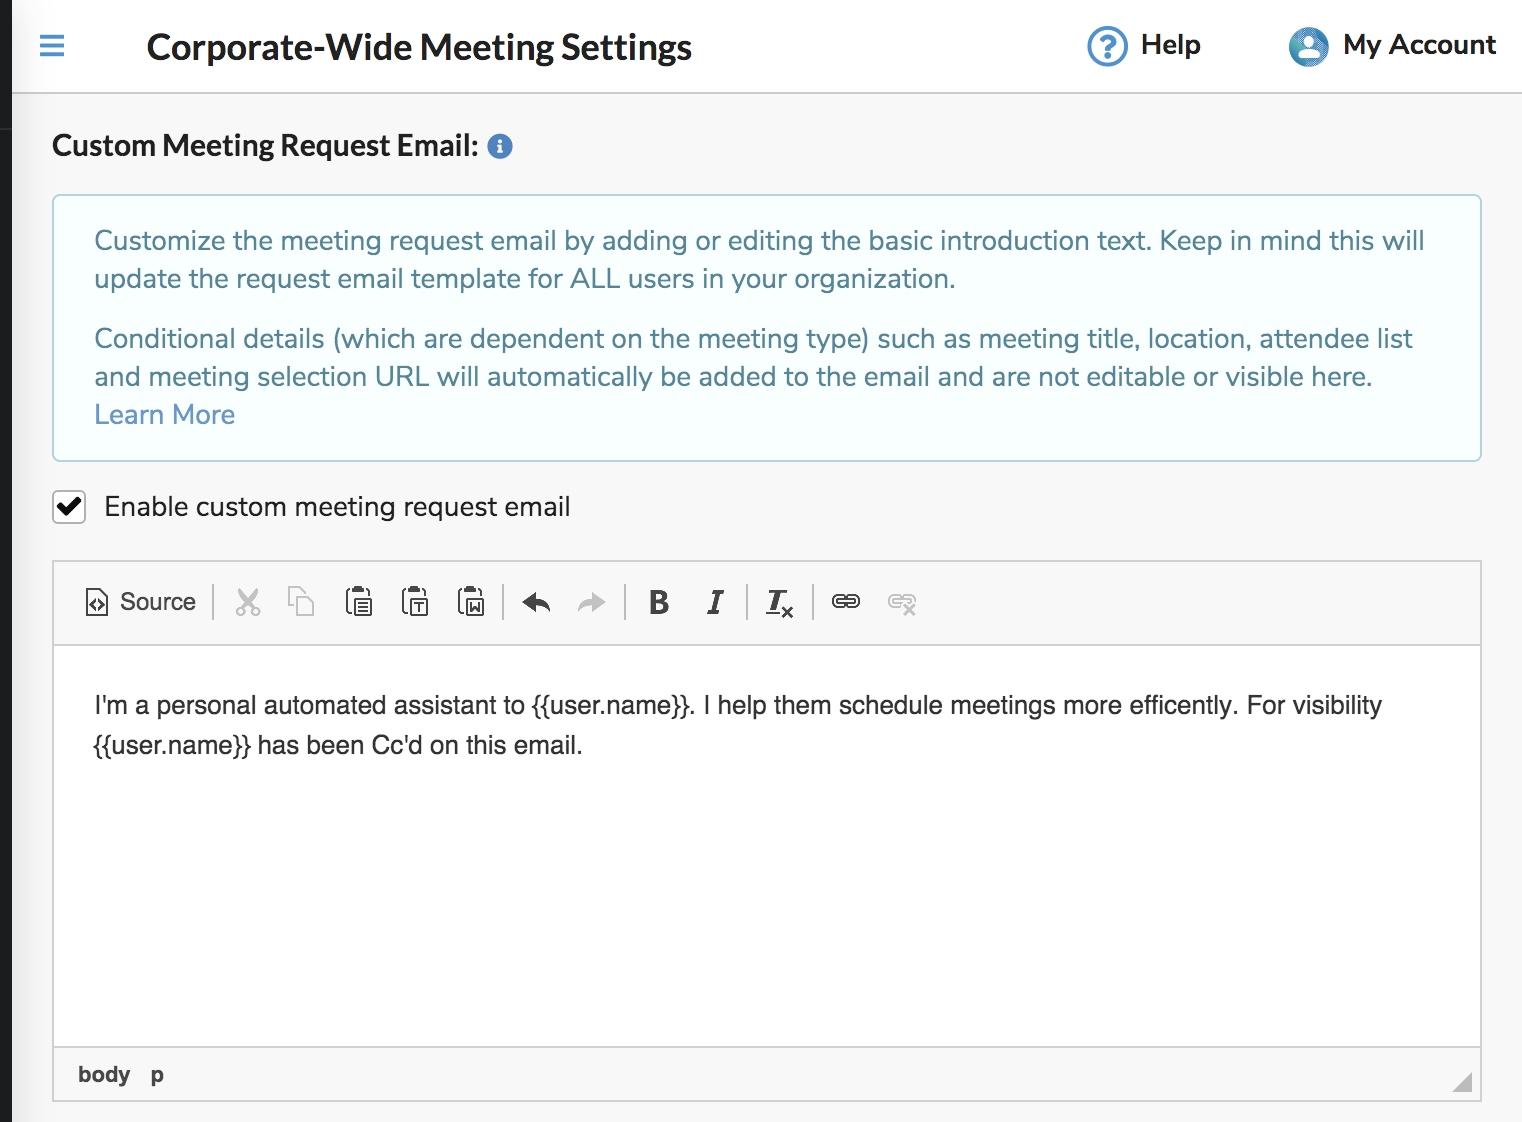 How Do Custom Email Invites Work? - Faq @ Zoom.ai